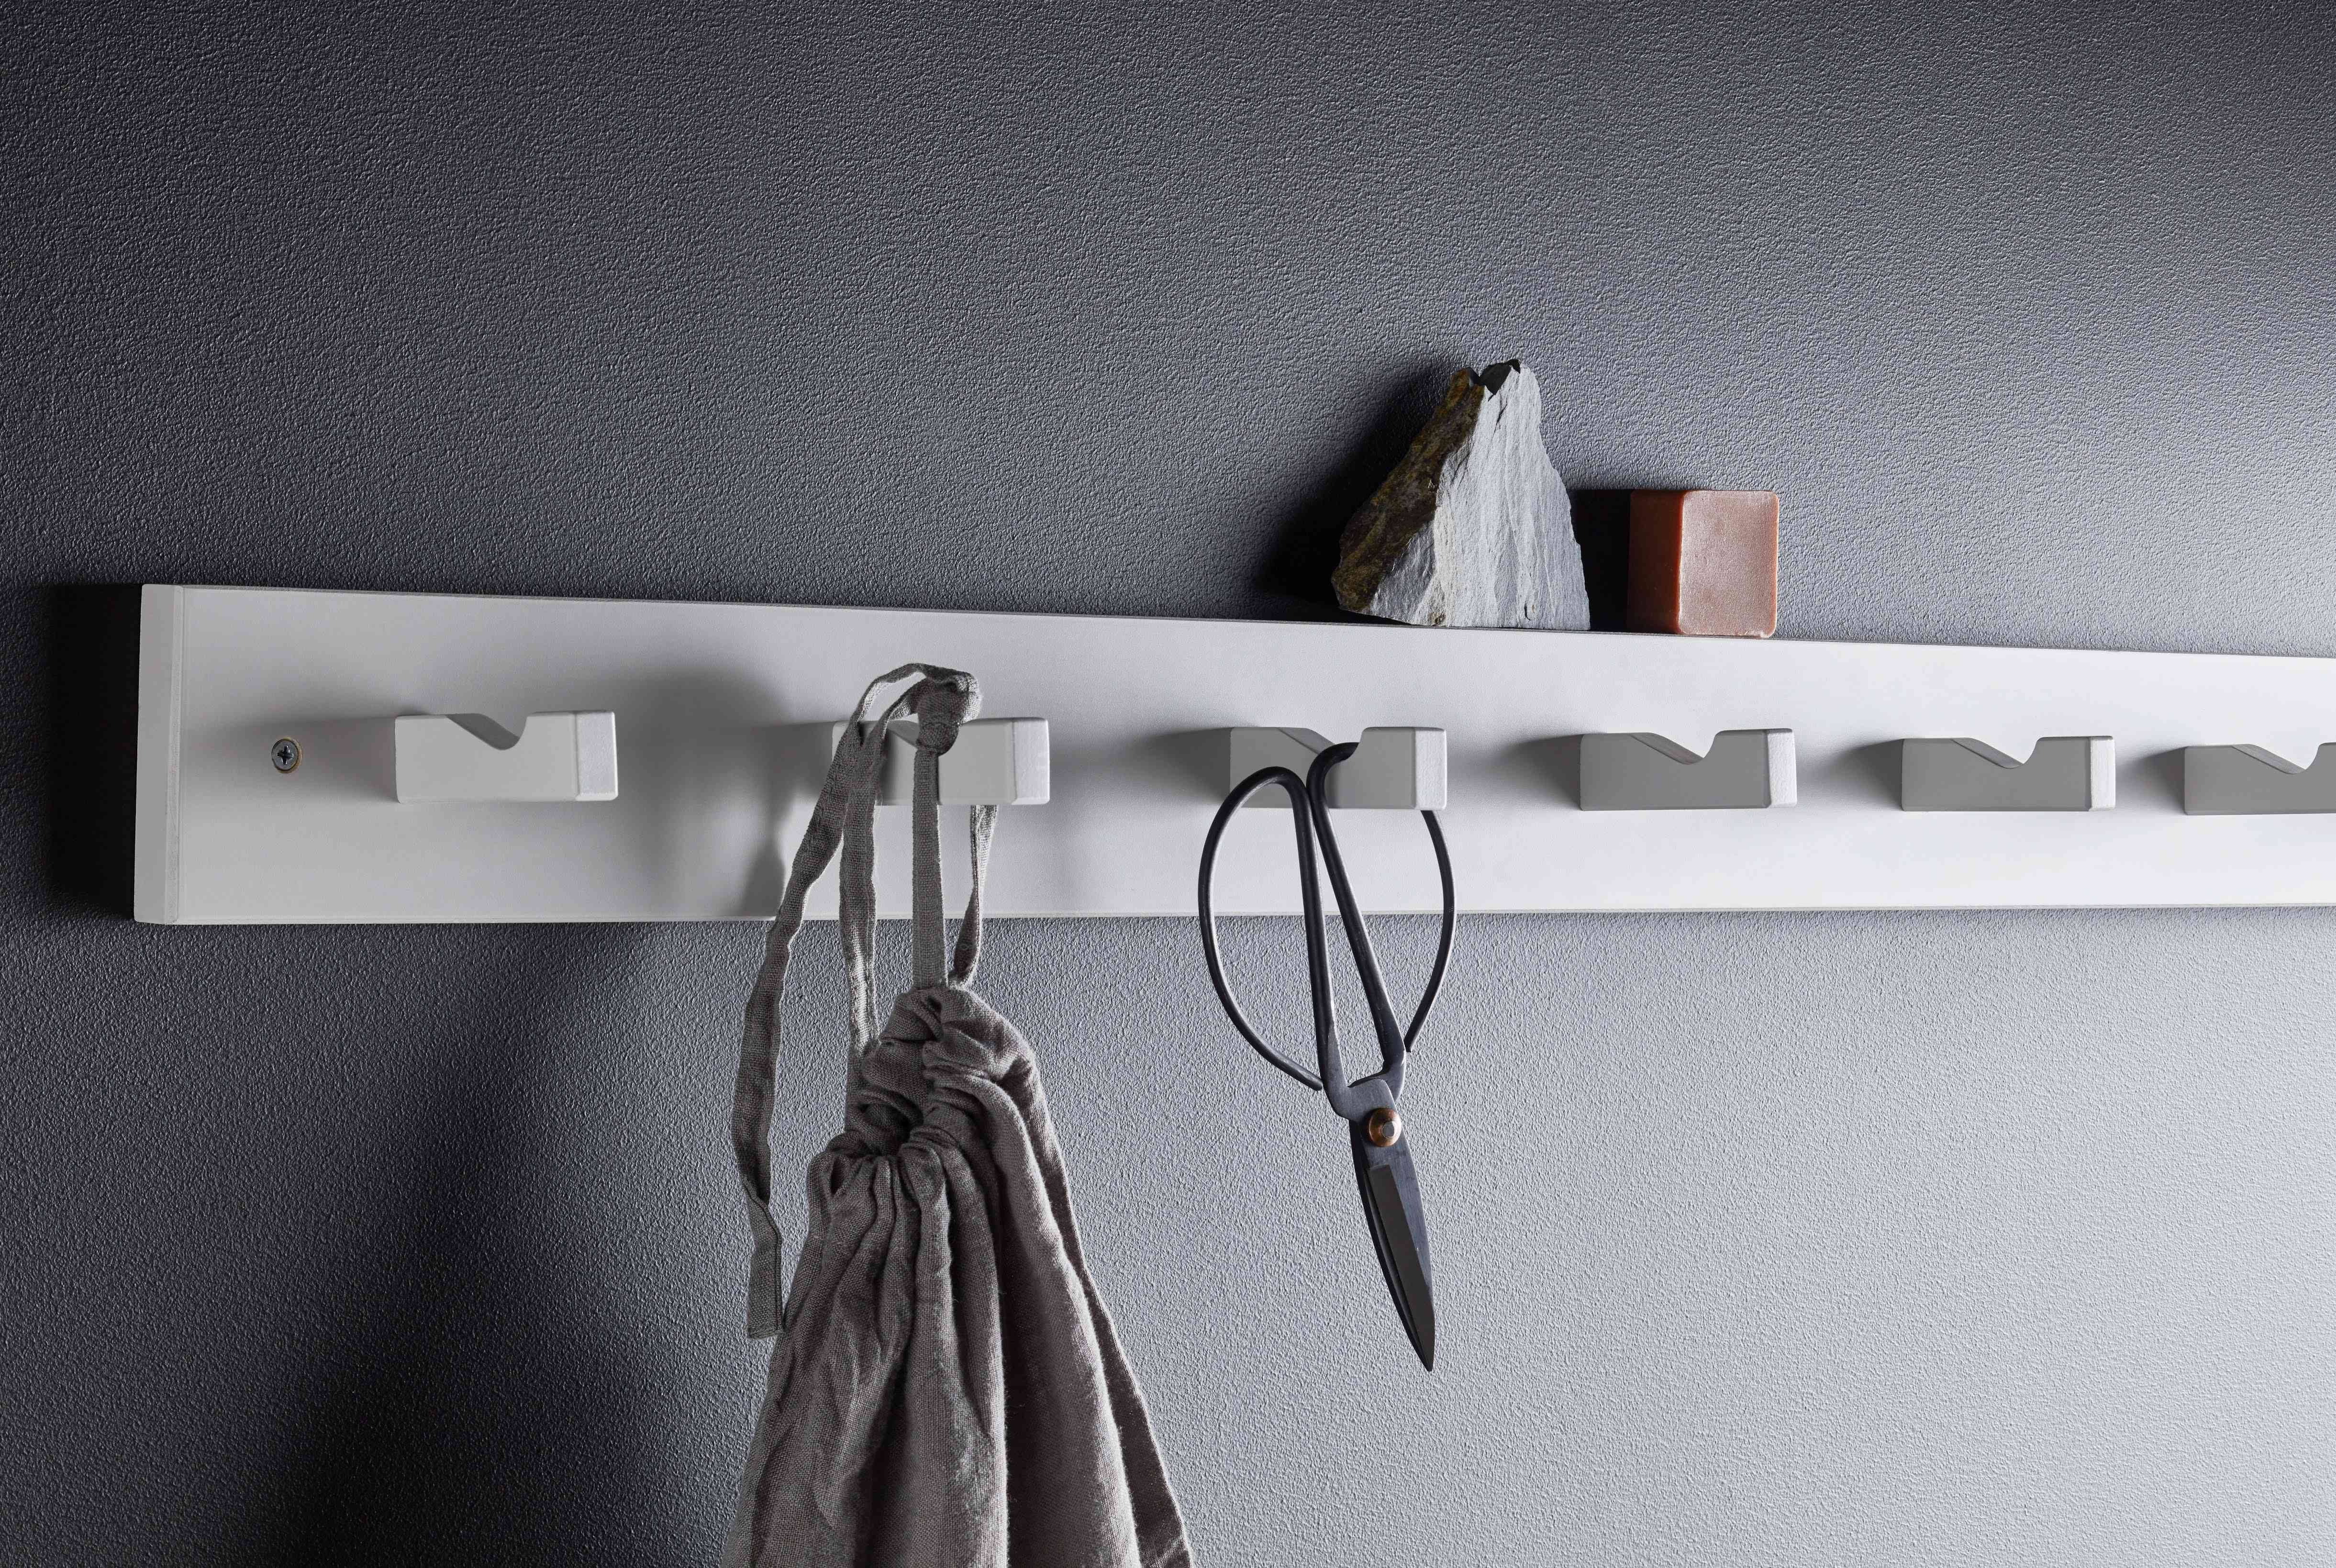 IKEA KUBBIS Rack With 7 Hooks, Gray